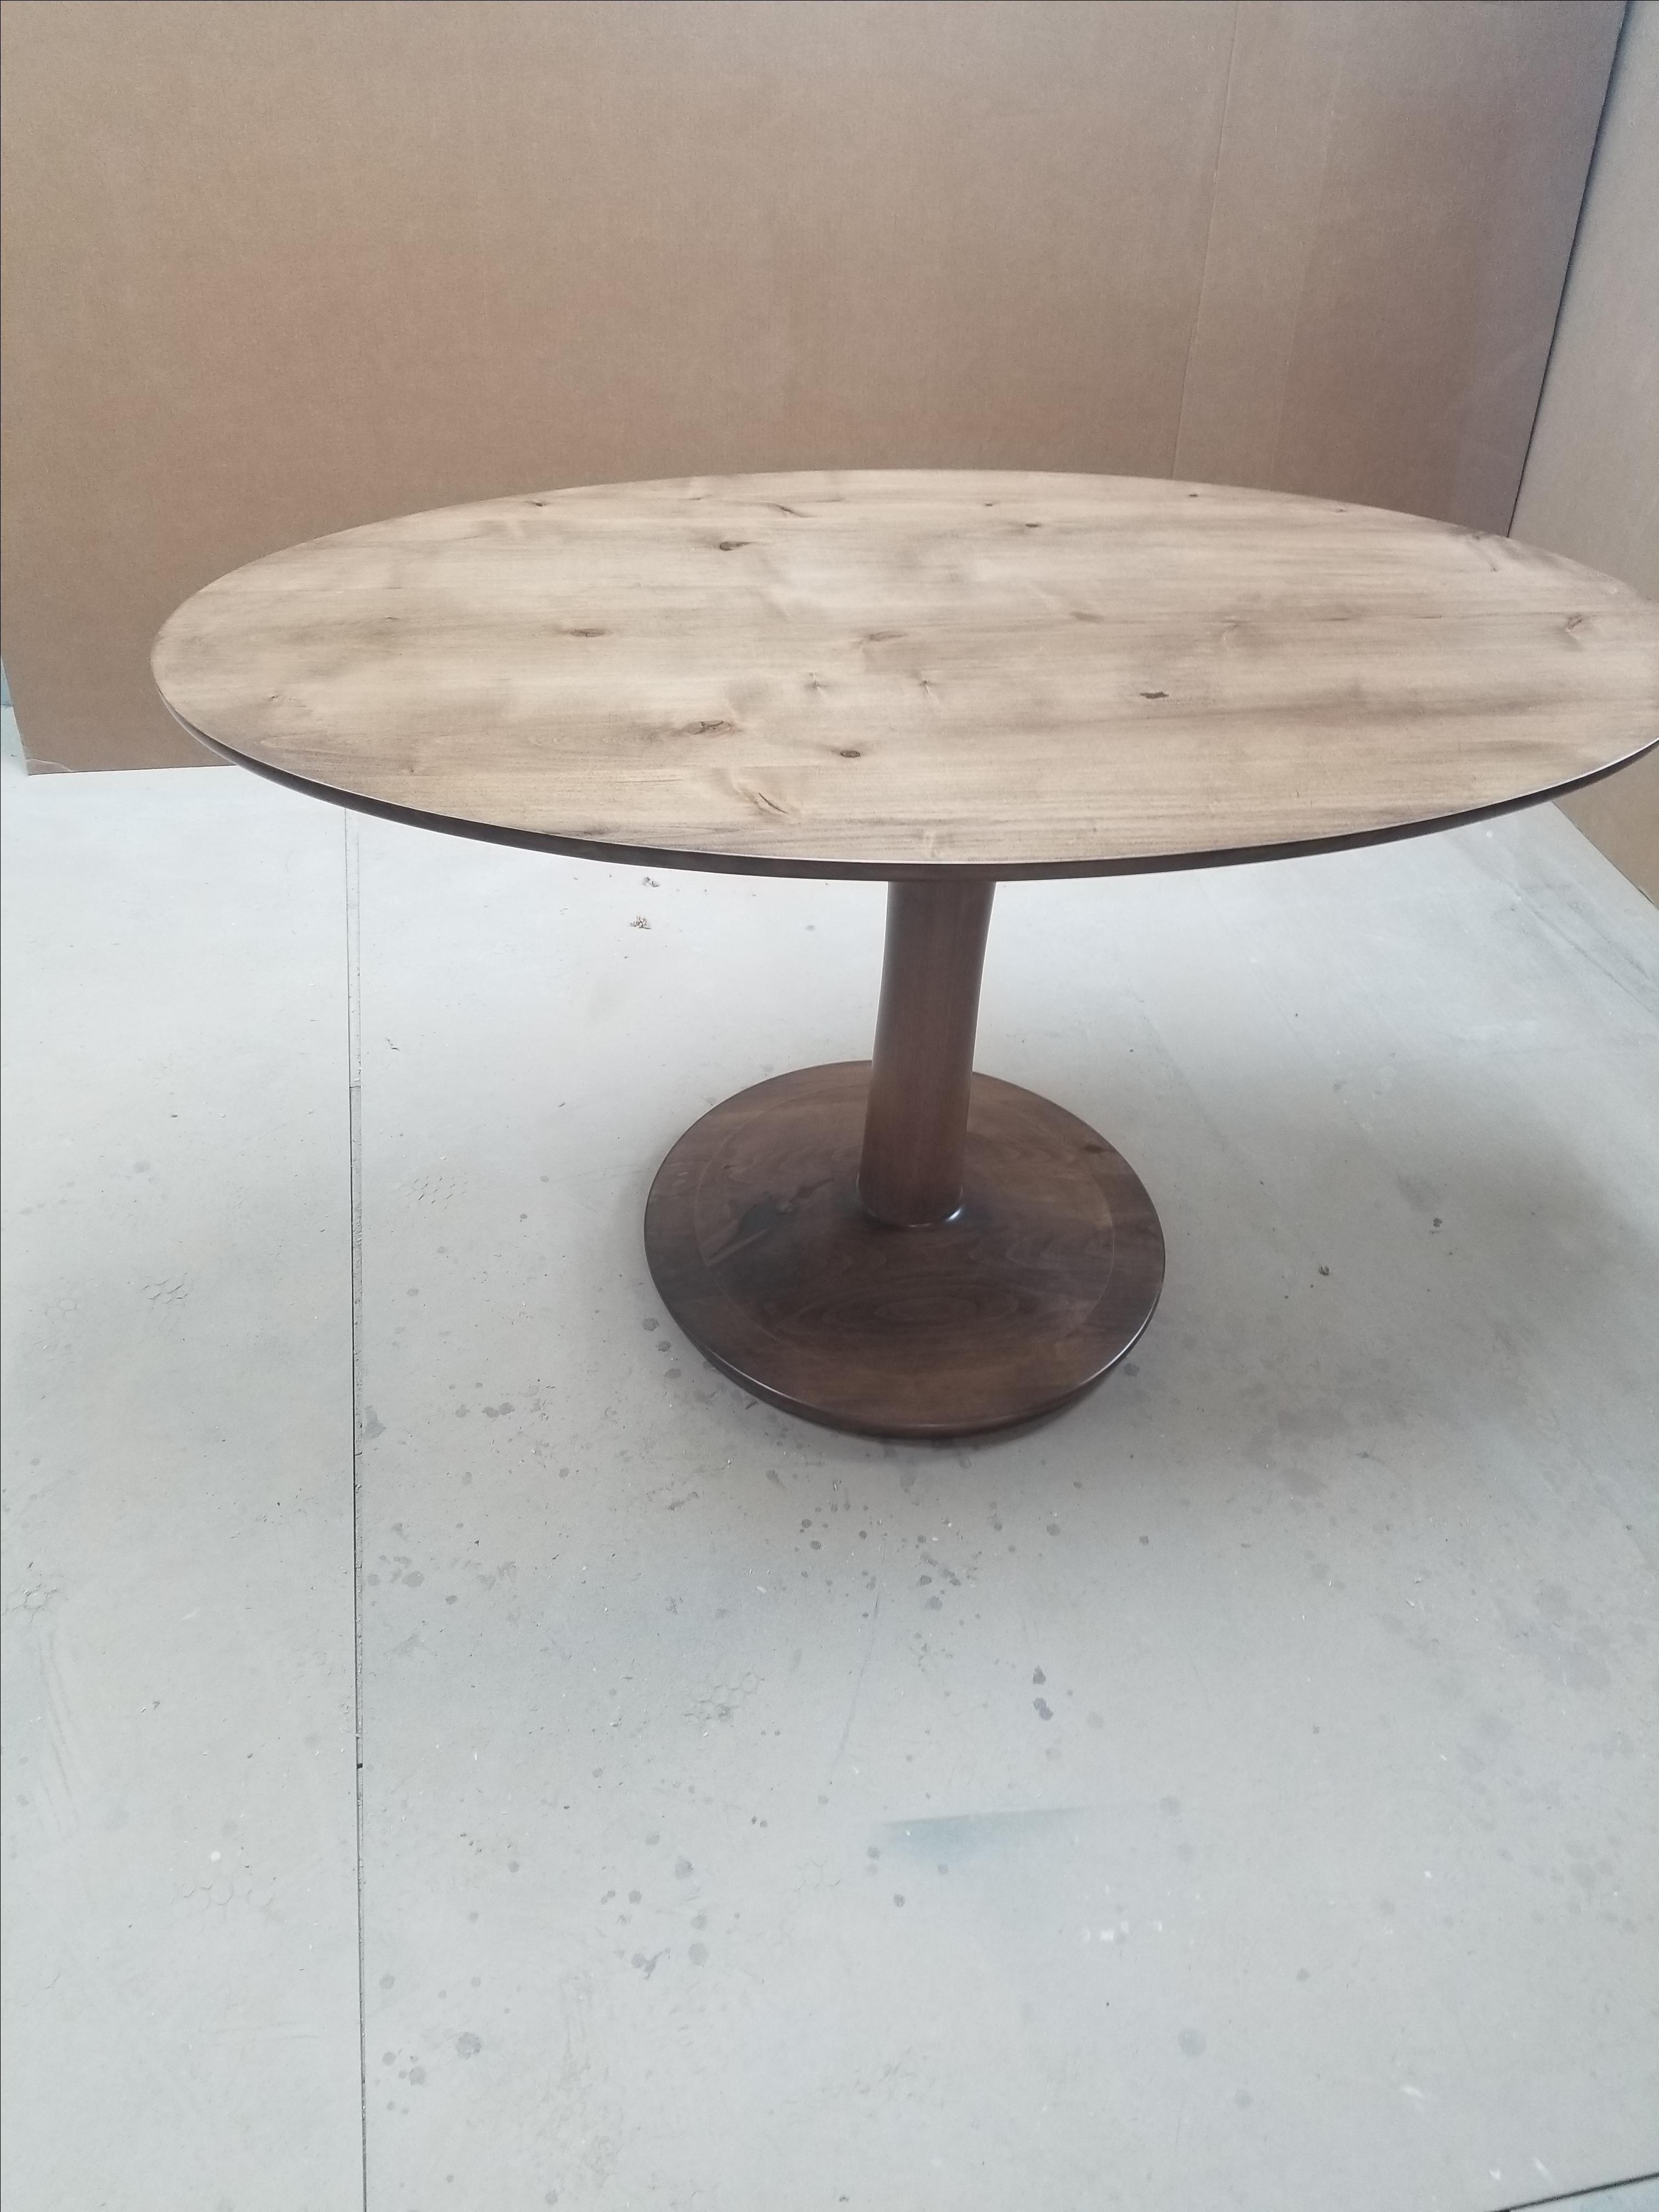 Handmade Custom Oval Dining Room Table In Knotty Alder By Kirk Kreations Custommade Com